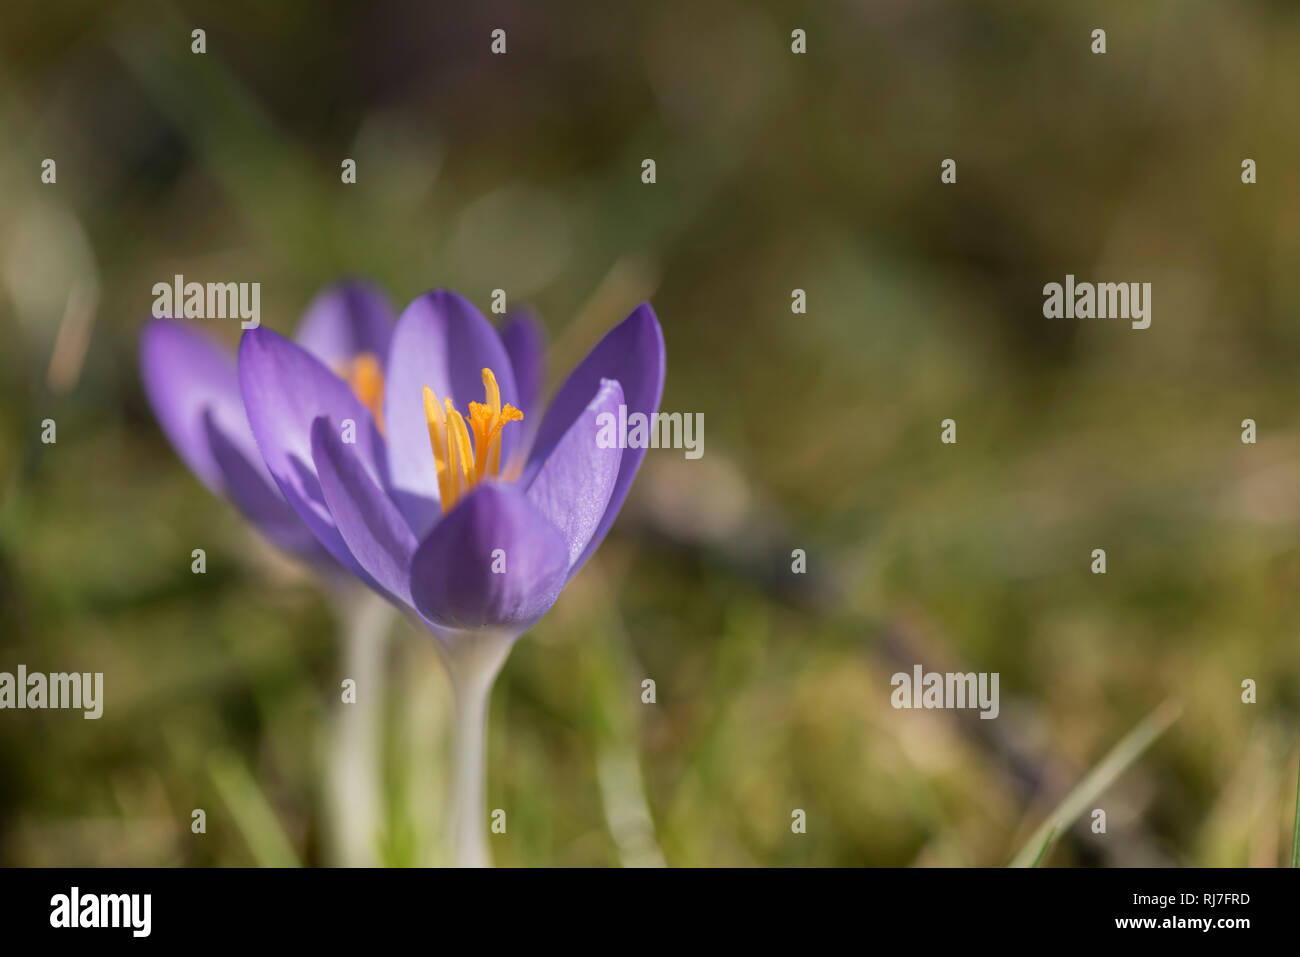 Fruhbluher In Der Natur Lila Krokusse Mit Geoffneten Sky Stockfoto